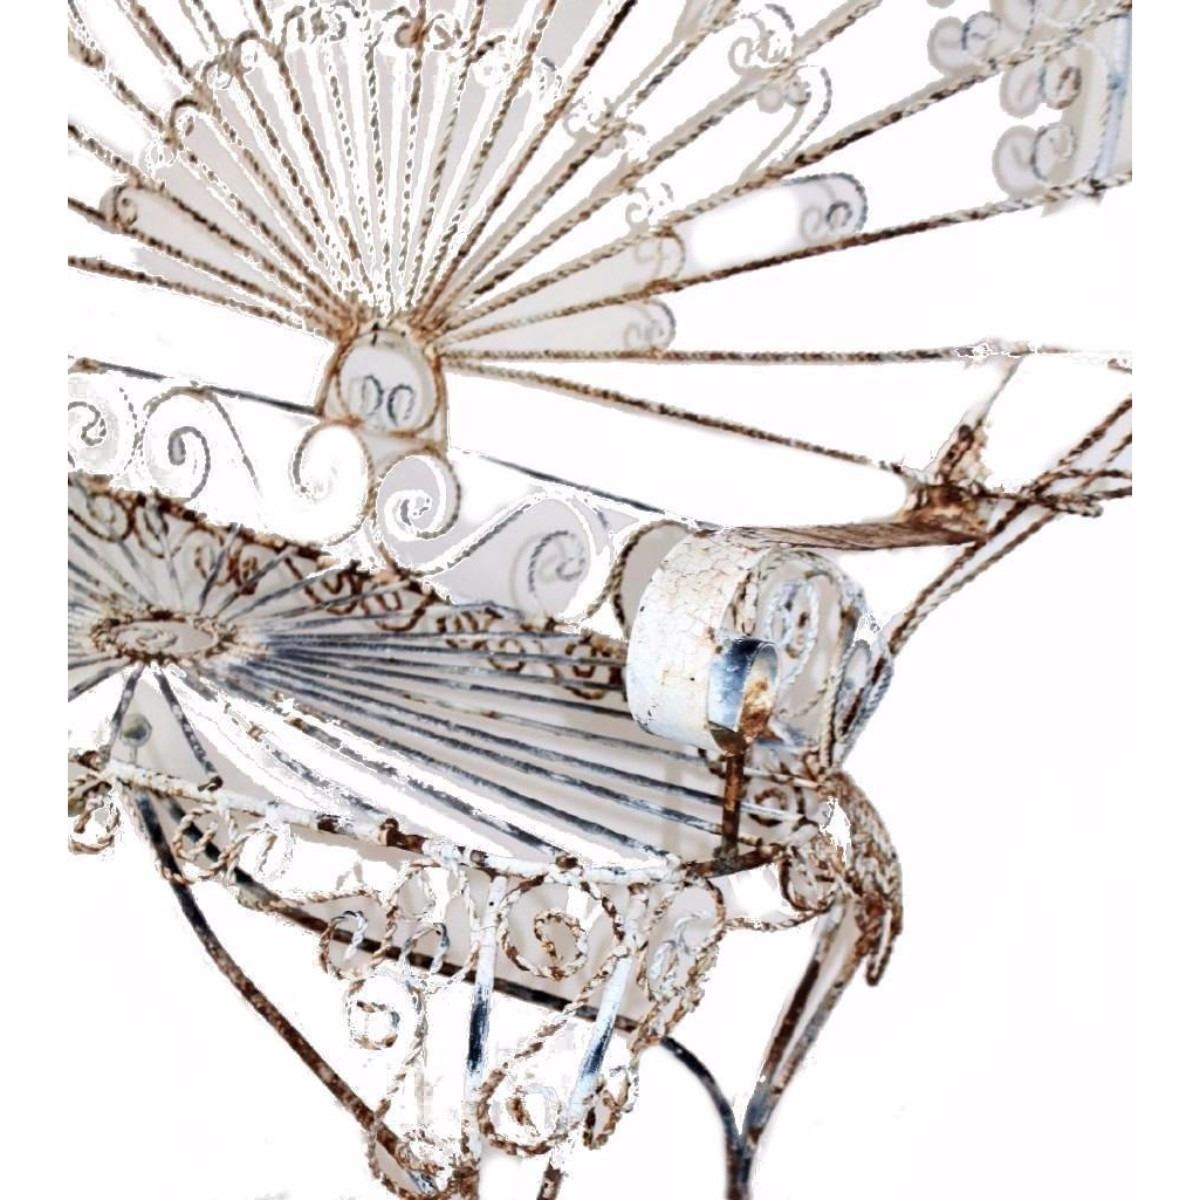 Astounding Antique Garden Bench Pabps2019 Chair Design Images Pabps2019Com